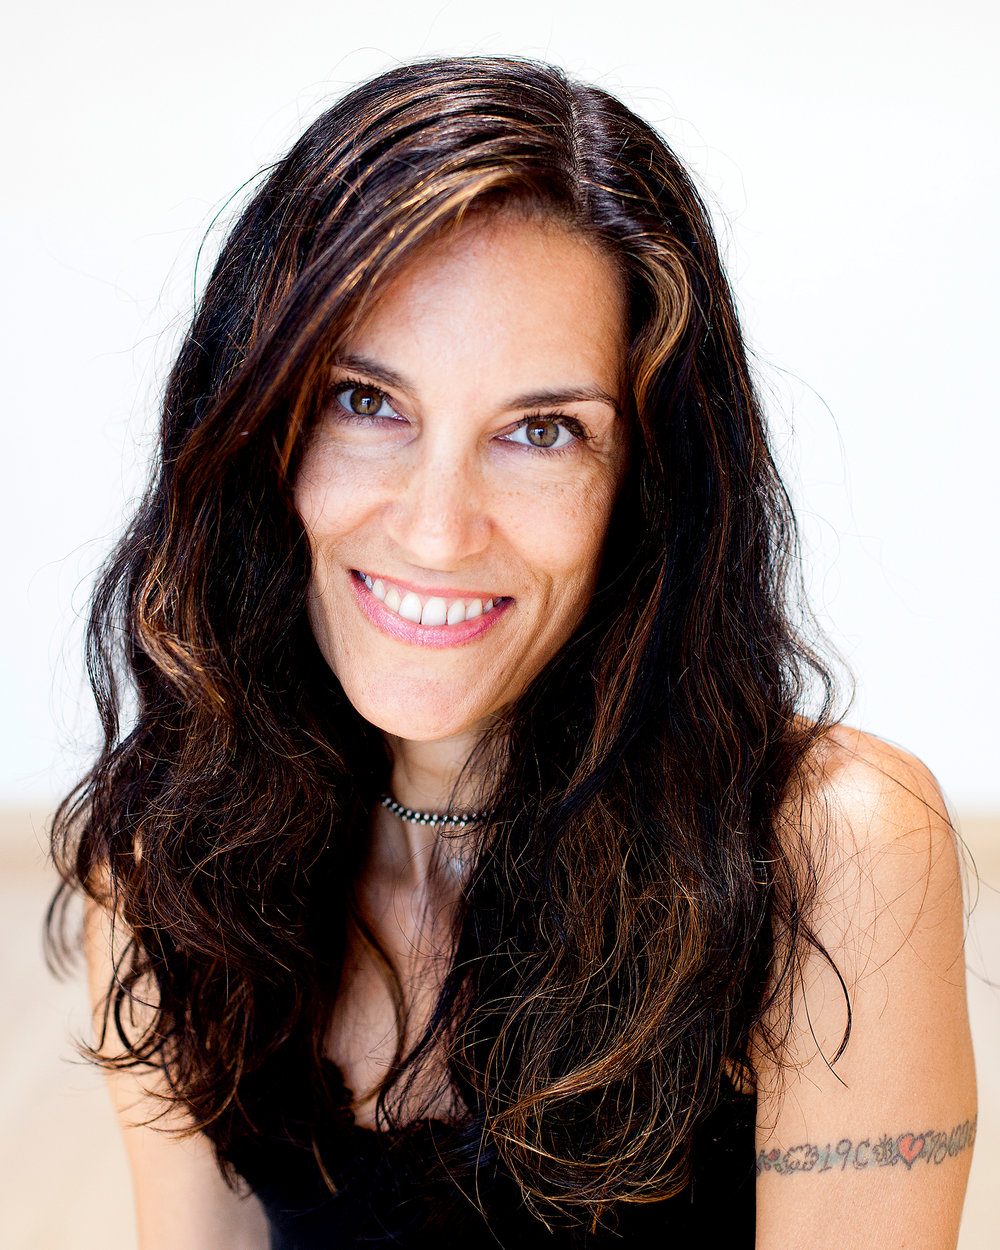 Maria Radloff